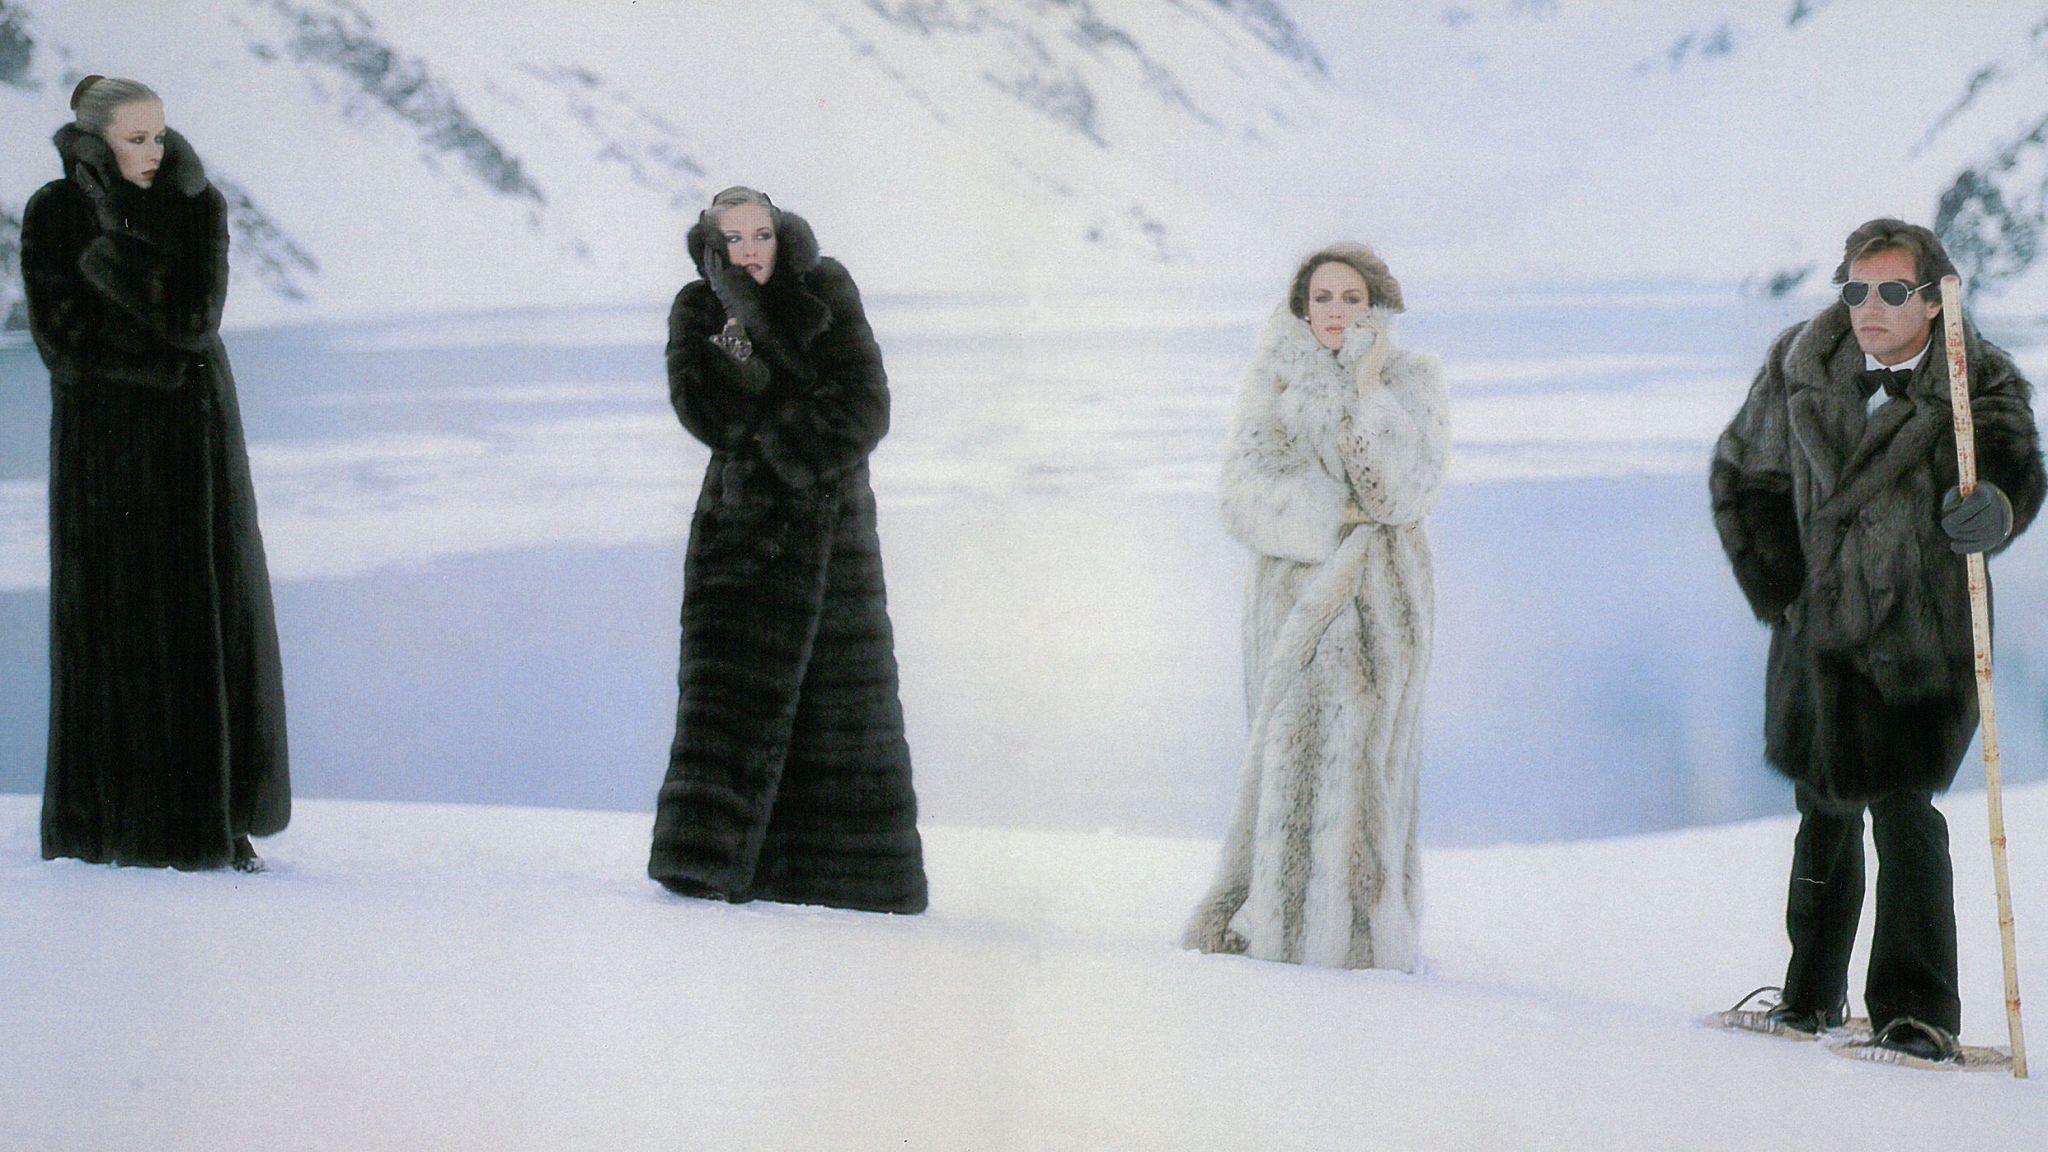 This Drug-Fueled, Multimillion-Dollar Supermodel Snowpocalypse Has Been Fashion's Best-Kept Secret Since '77